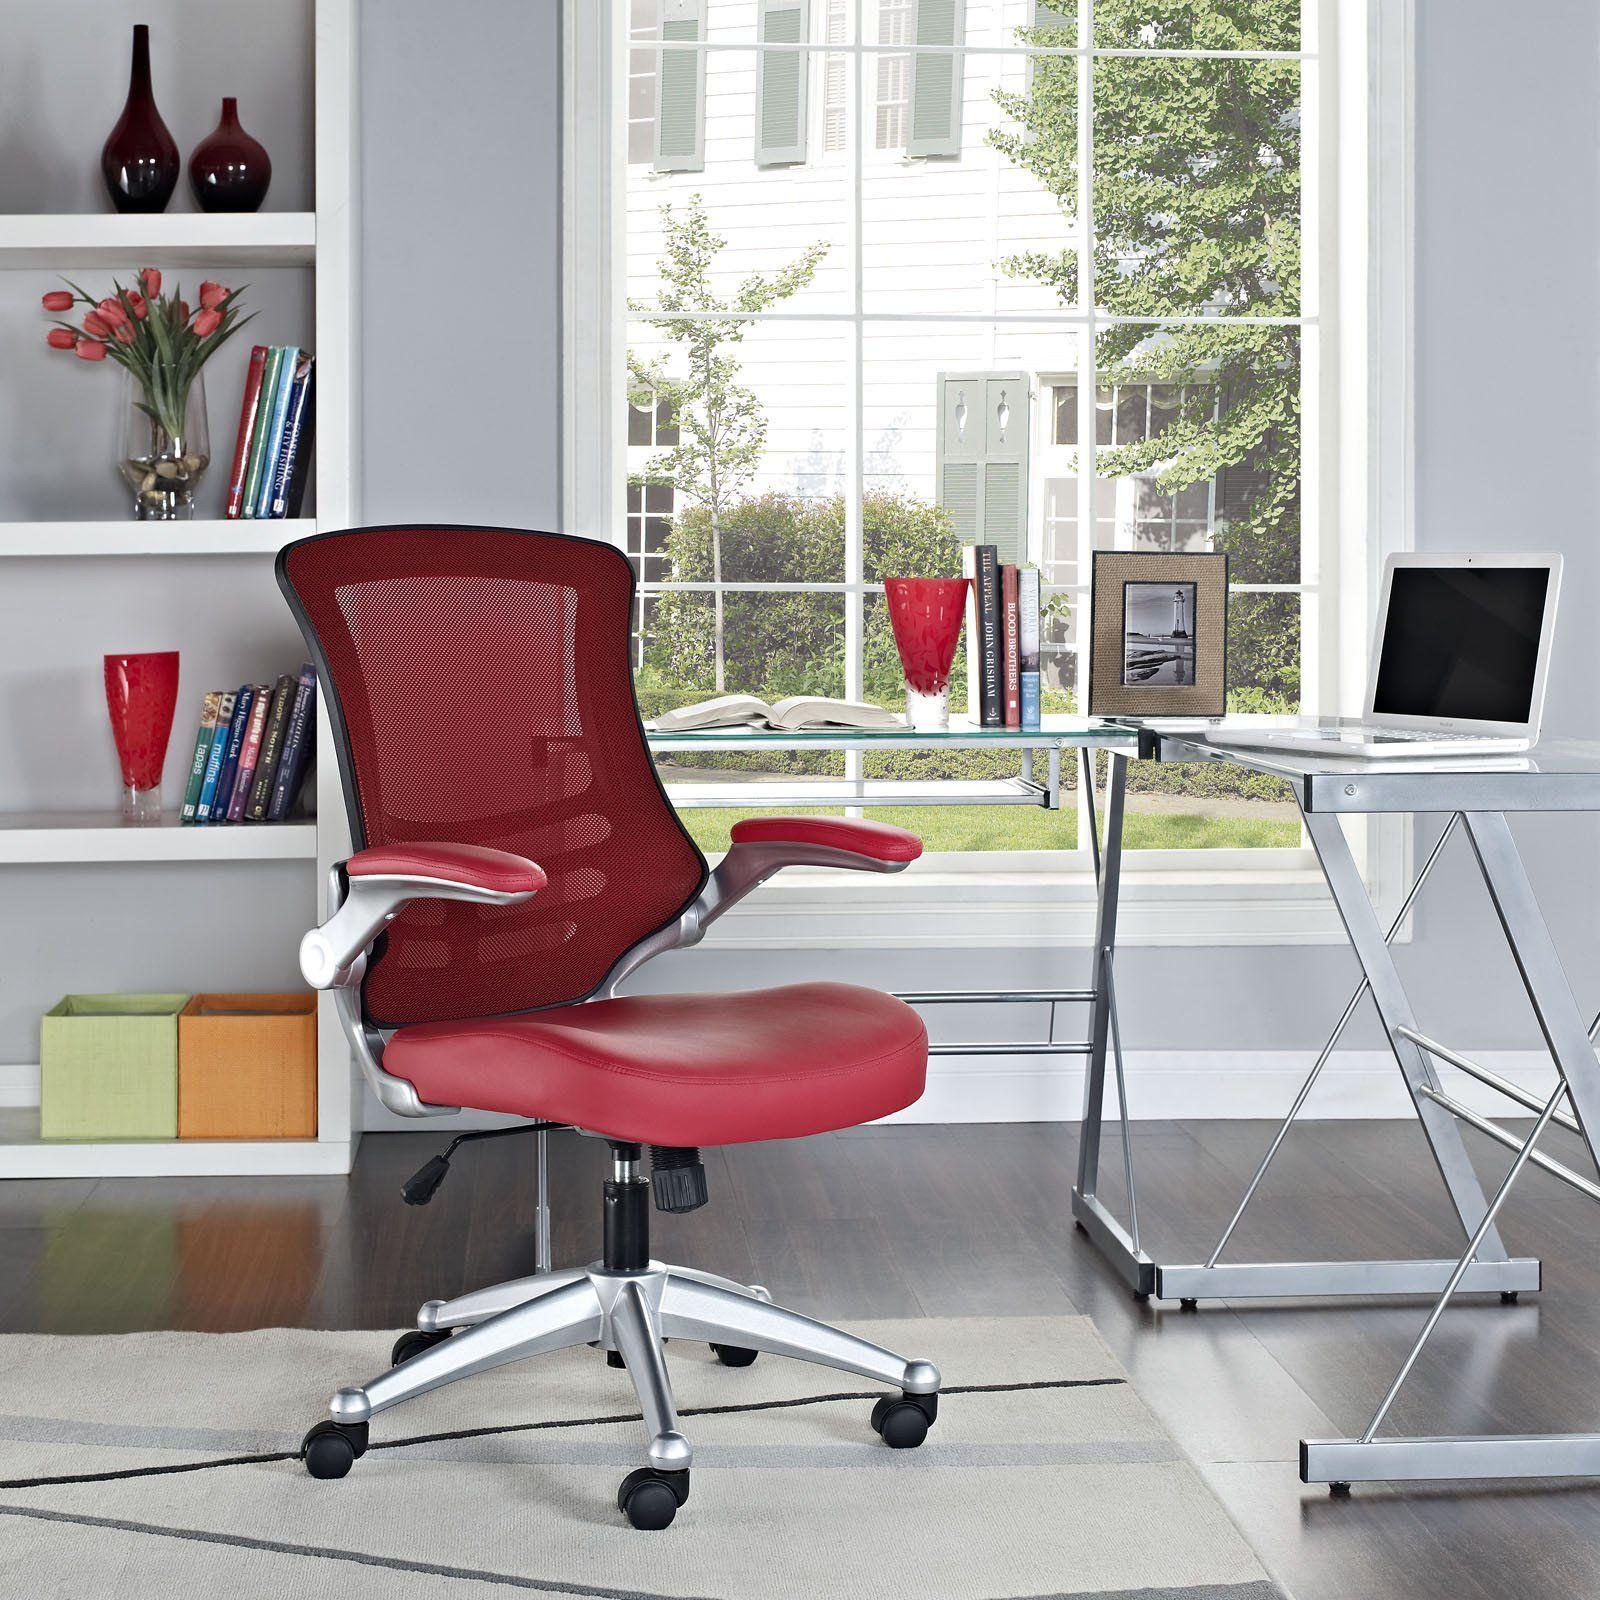 Modway Modern Attainment Adjustable Computer Office Chair Eei 210